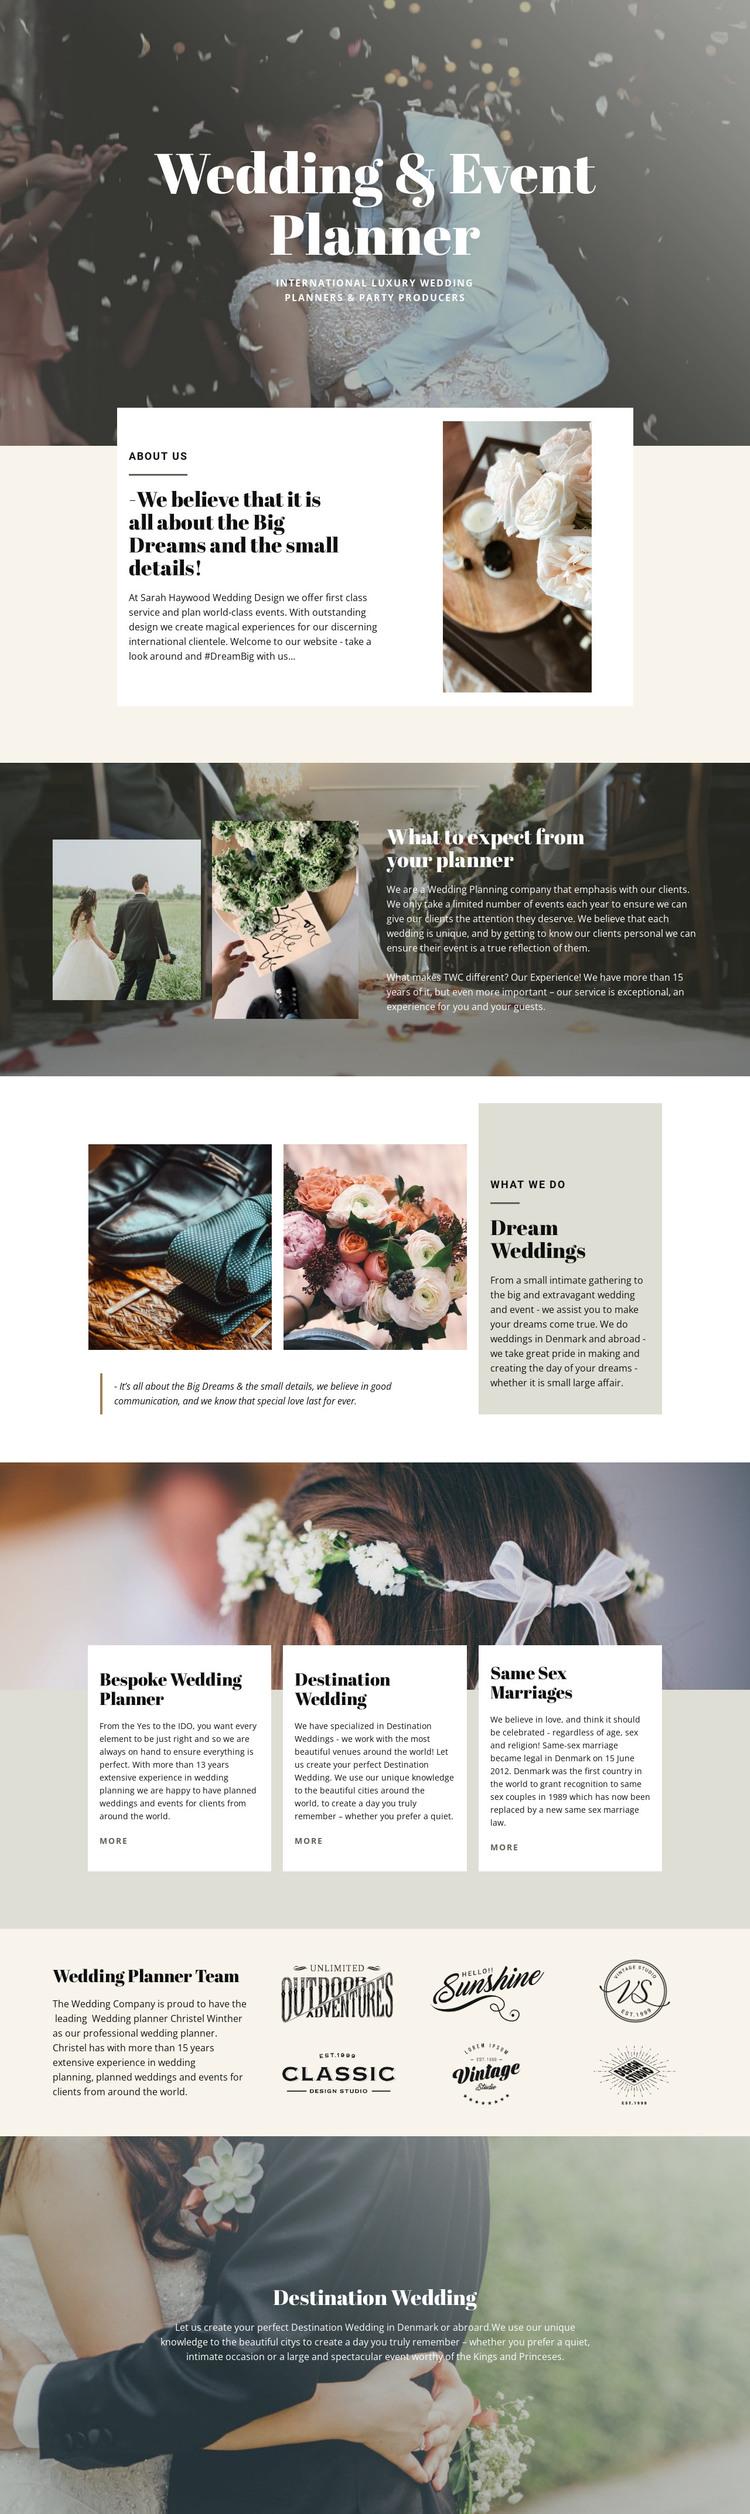 Biggest dream wedding Web Design